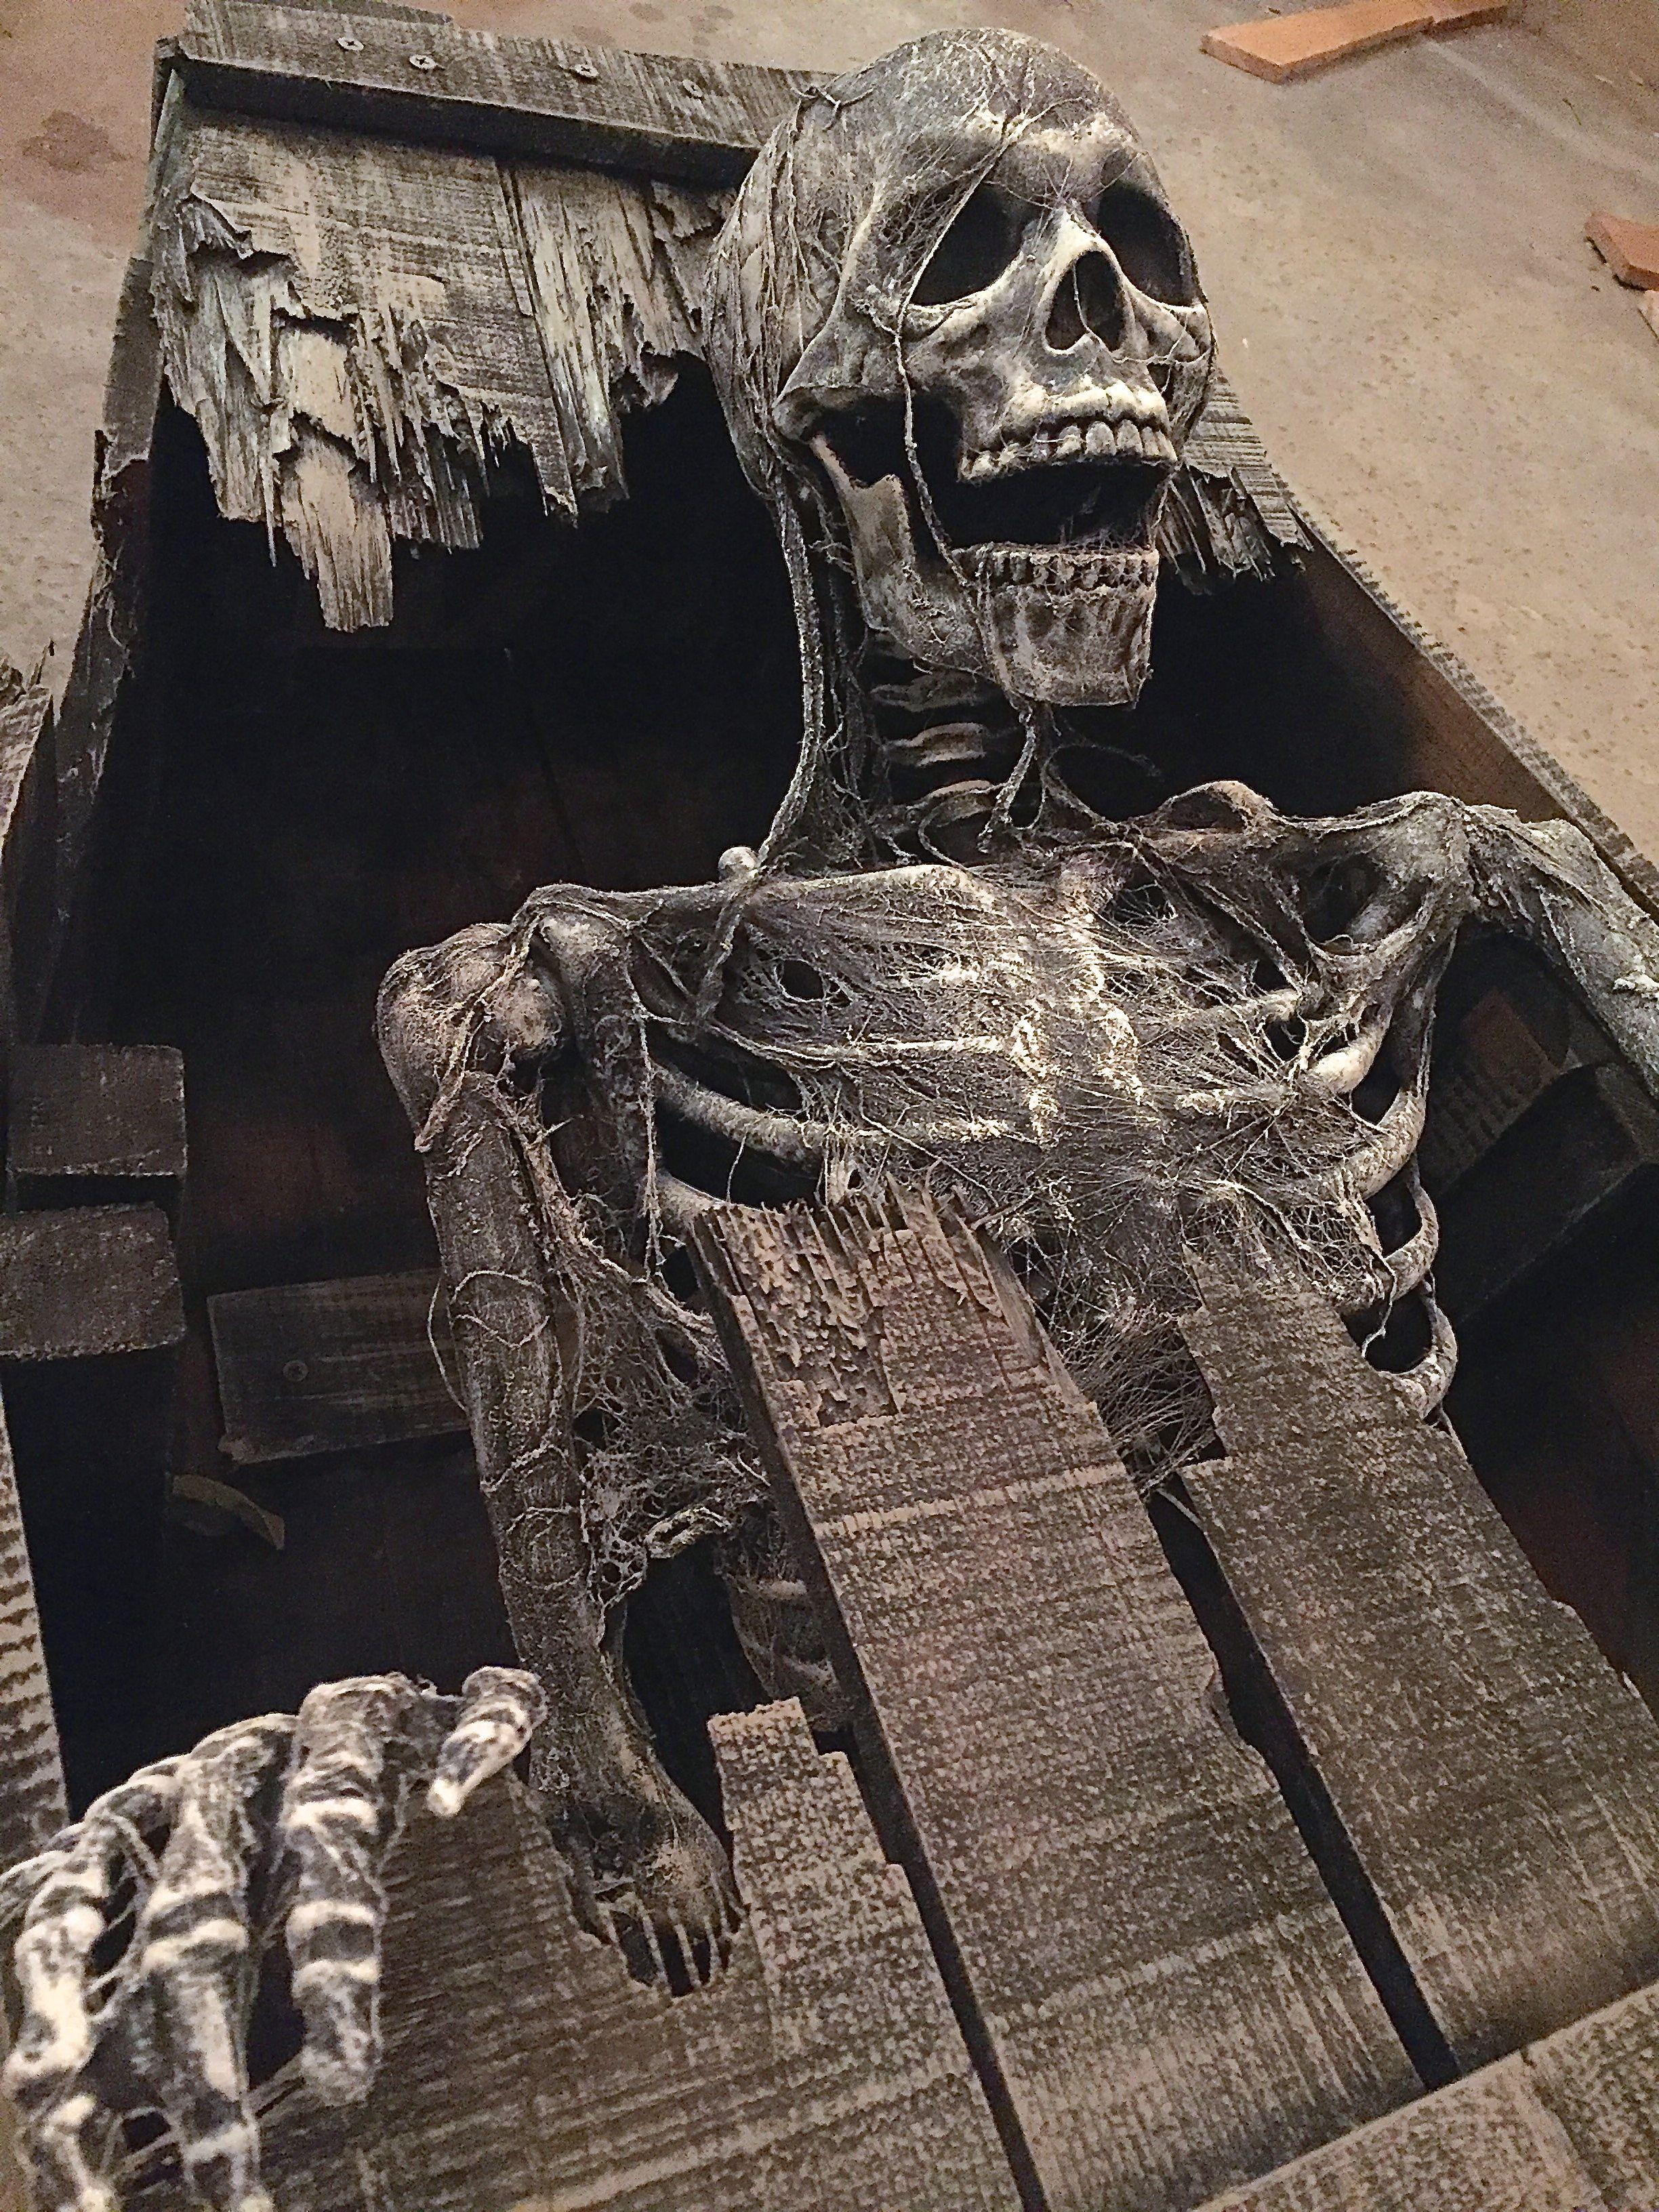 Skeleton Corpsing And Rotting Halloween Graveyard Coffin Halloween Home Haunt